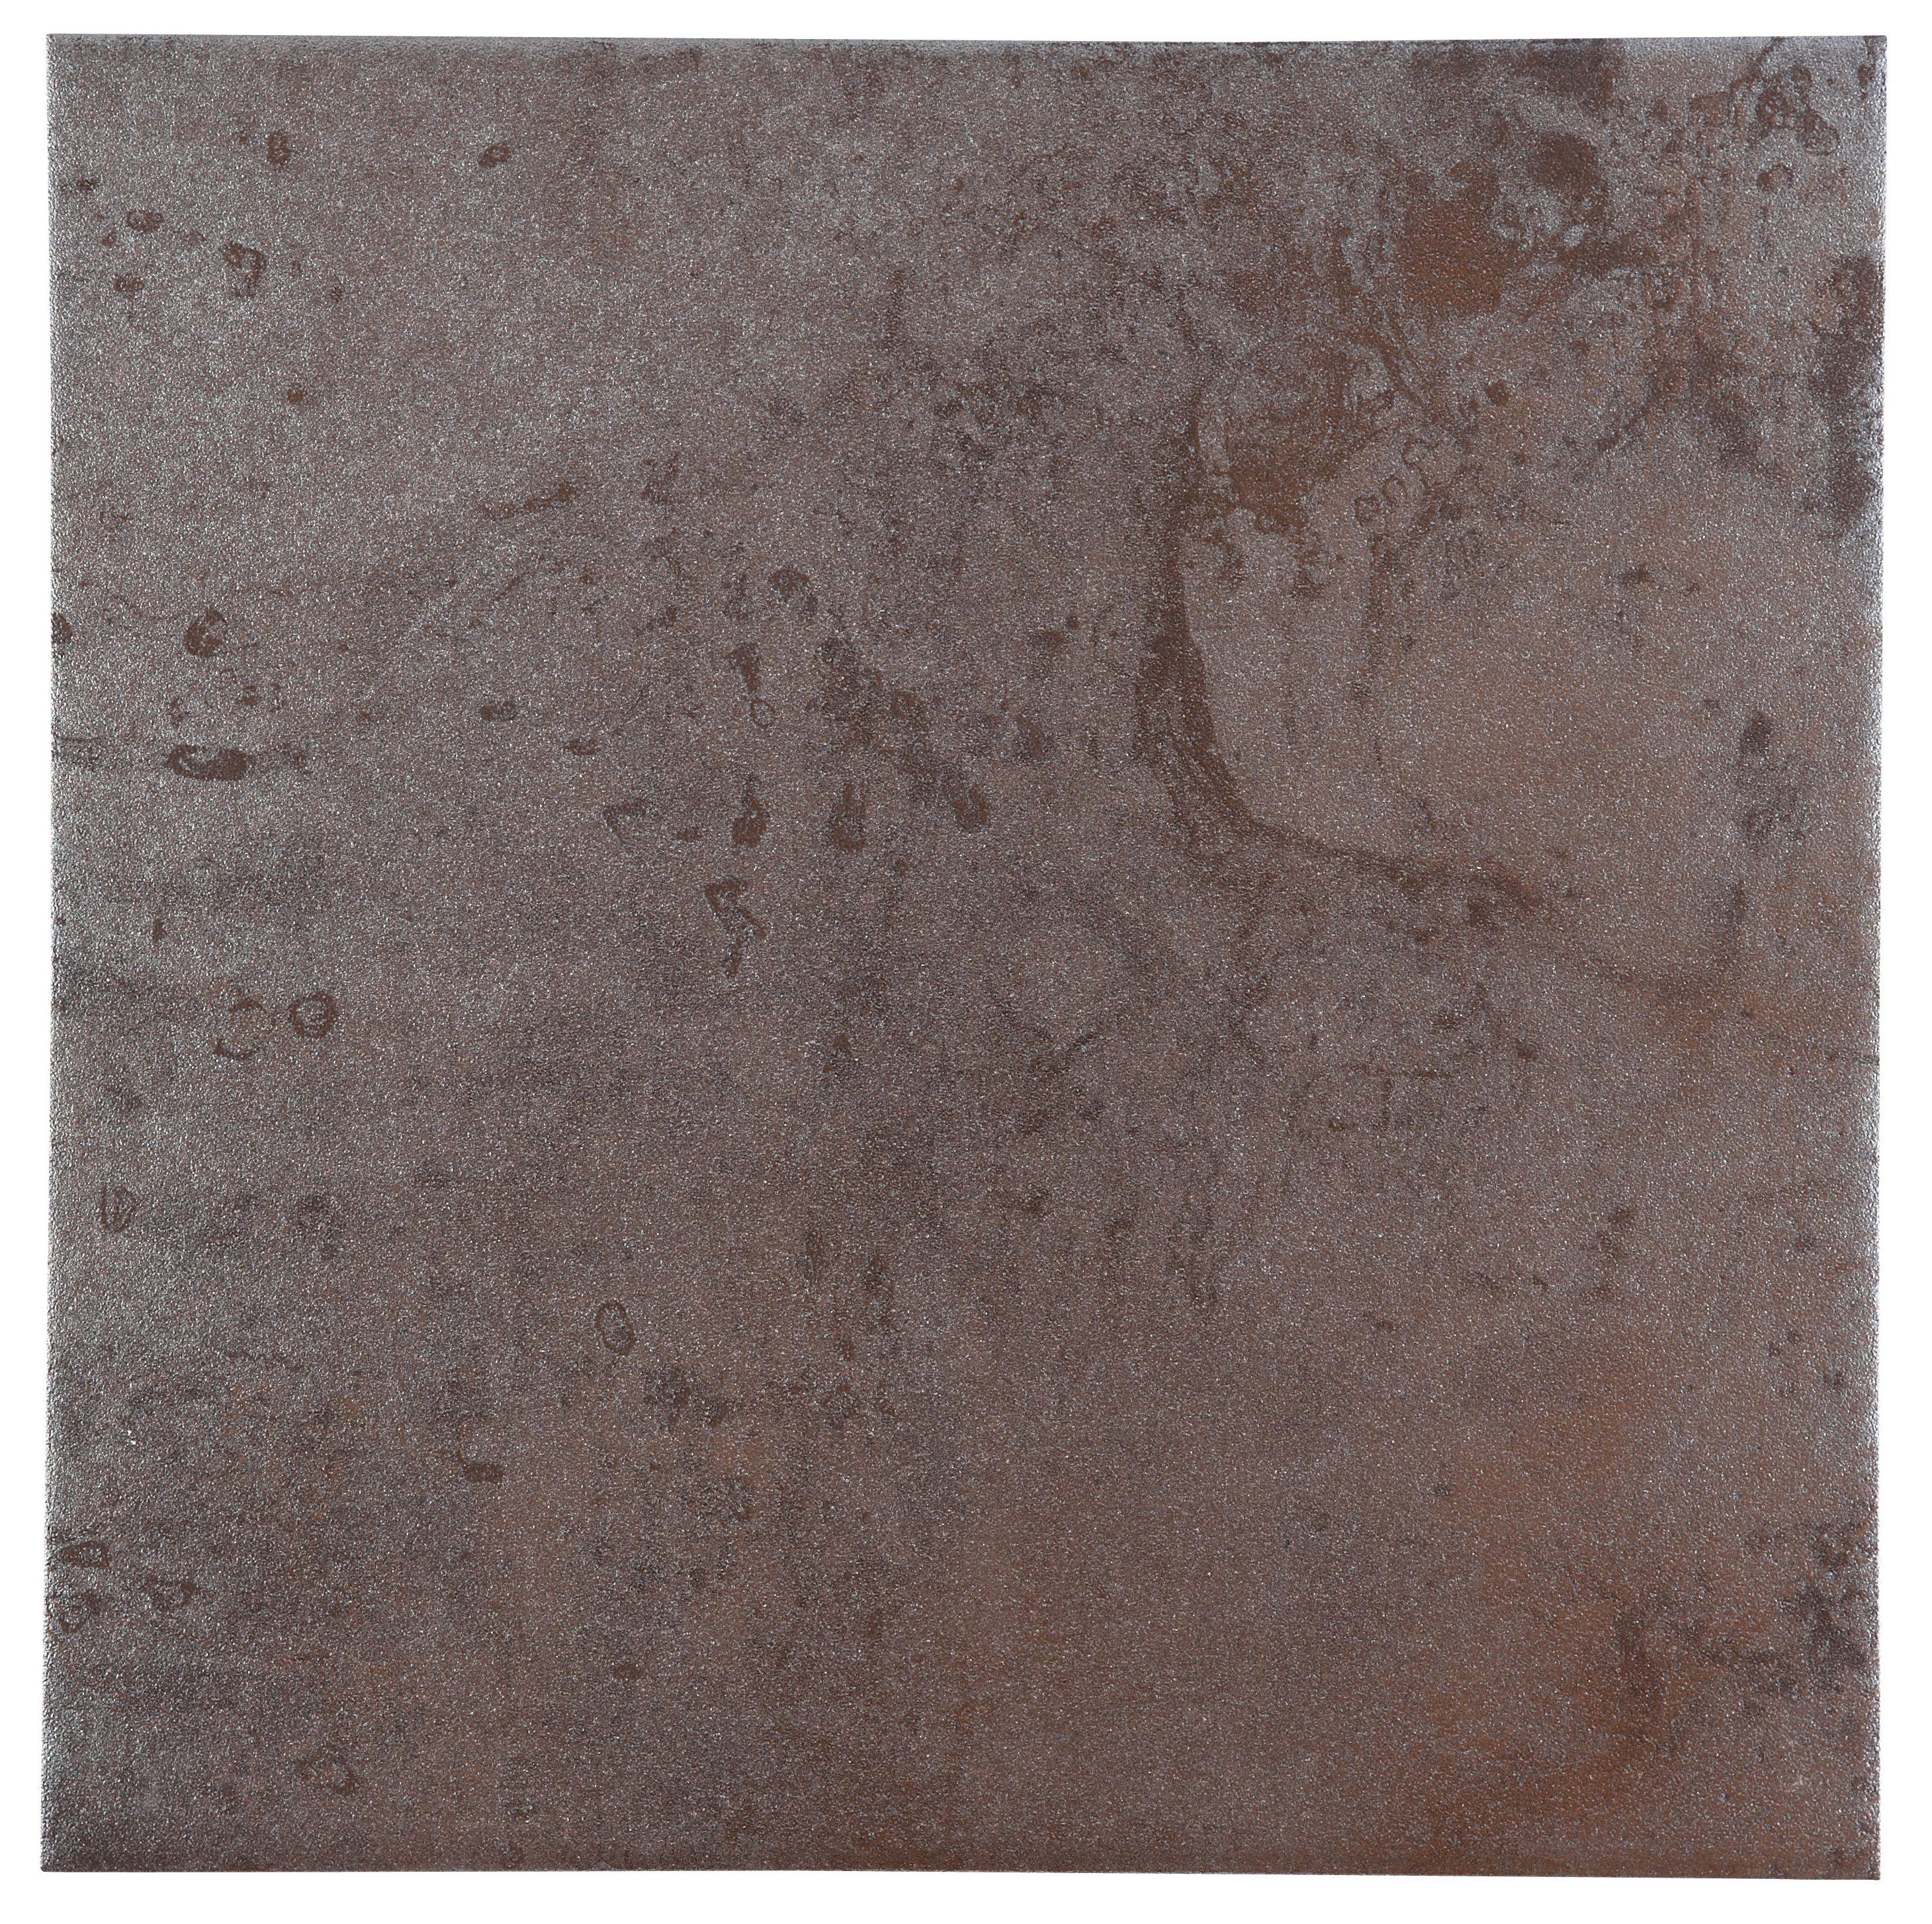 Natural Travertine Mosaic Tile L 300mm W 300mm: Metallic Grey Copper Effect Patterned Porcelain Floor Tile